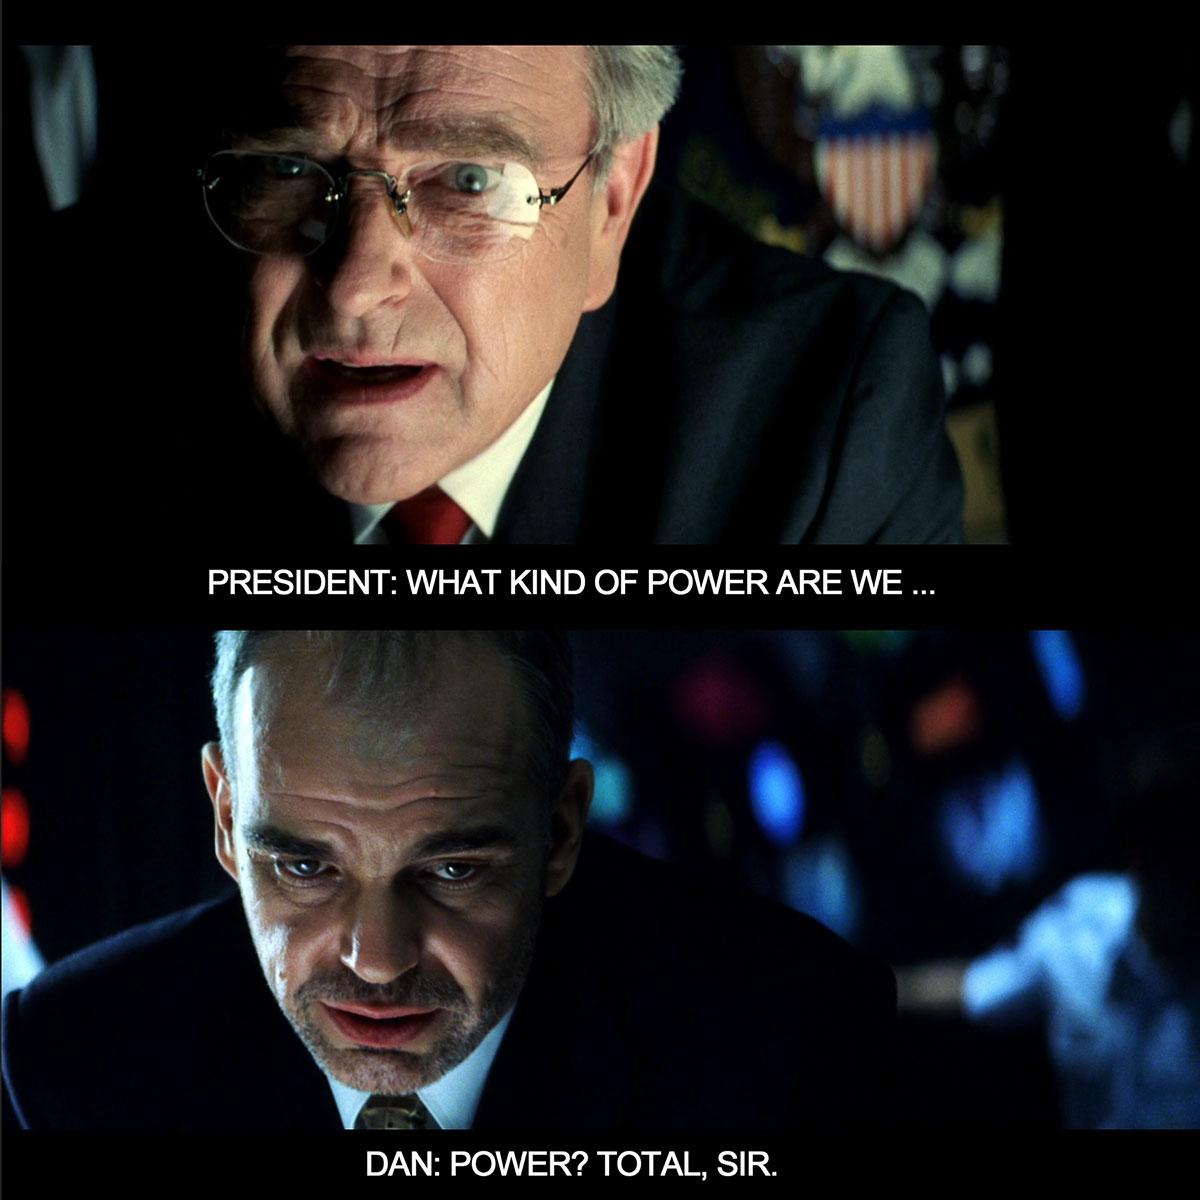 ARMAGEDDON_POWER.jpg